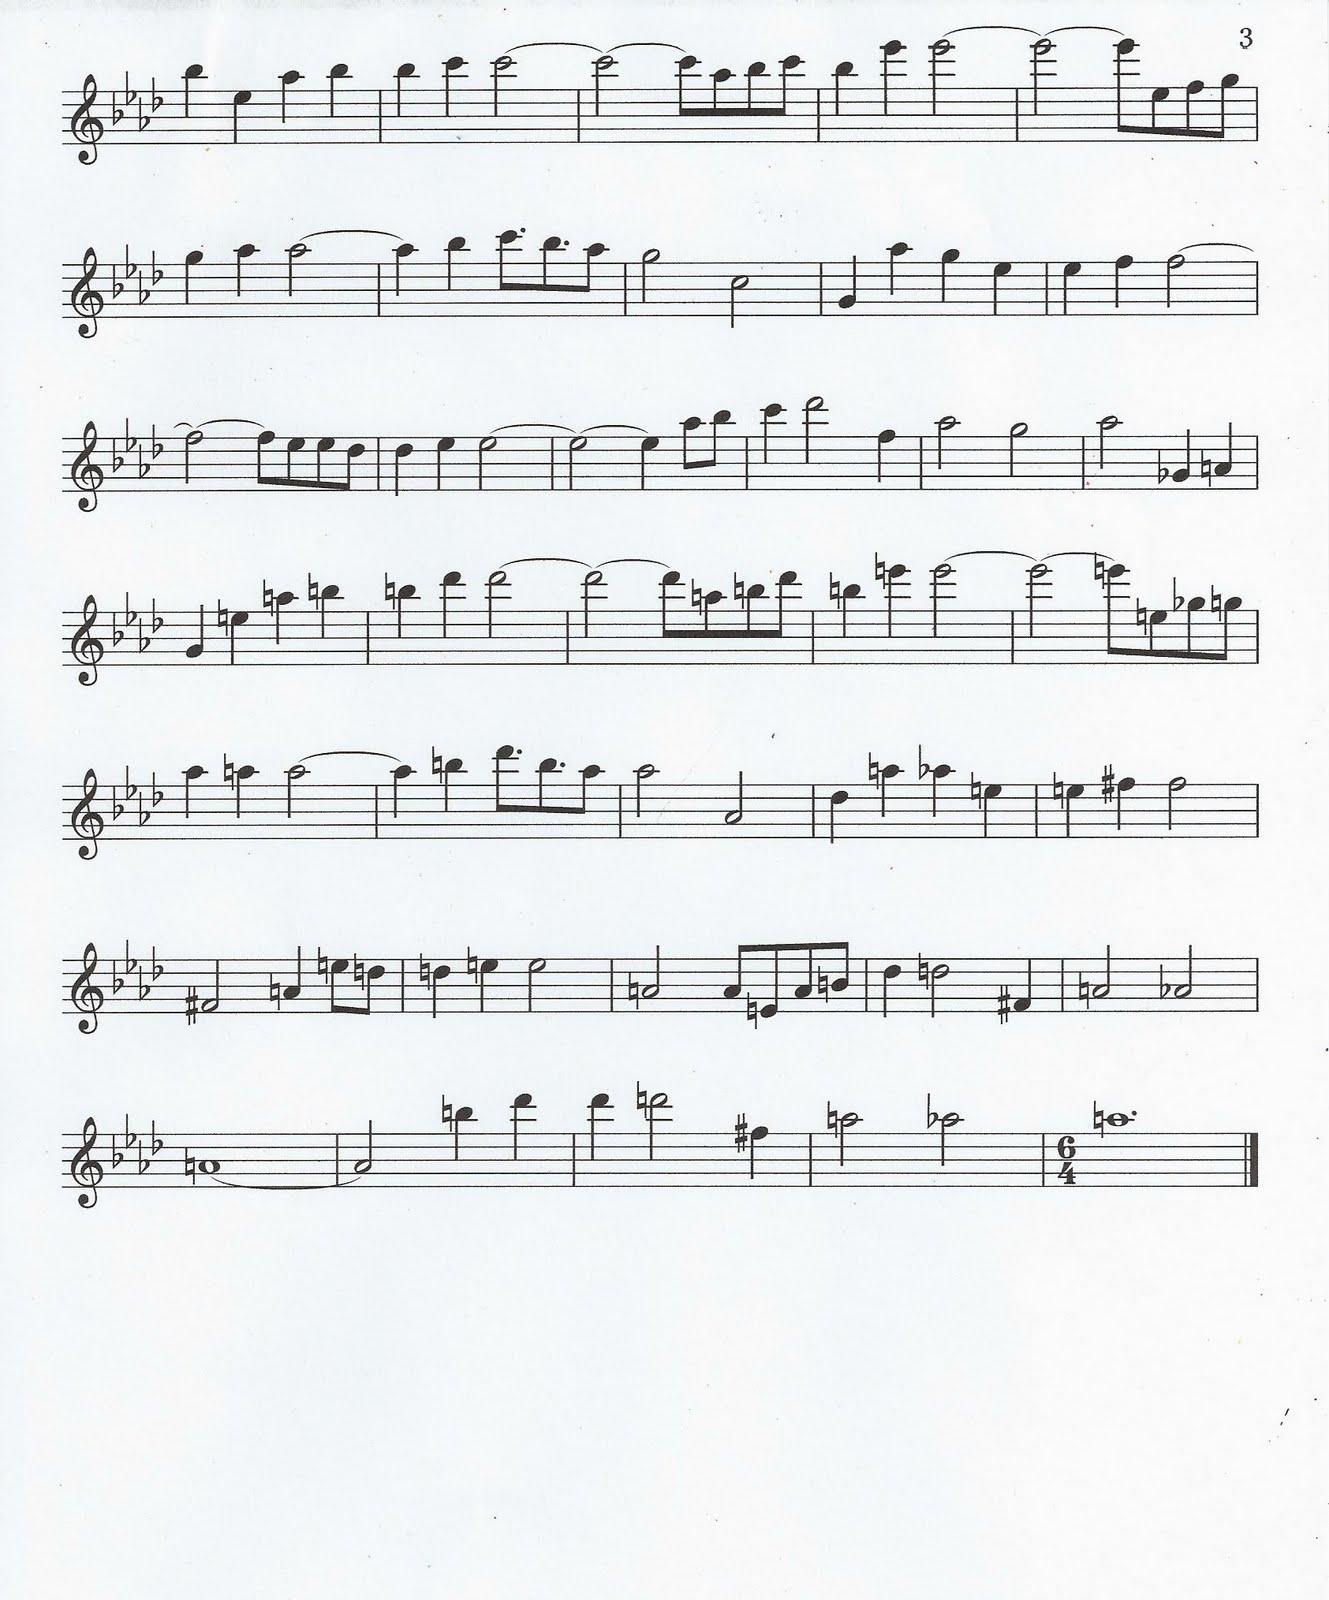 Bollywood Sheet Music September 2011: Flute & Tenor Sax Sheet Music :): Kiss The Rain